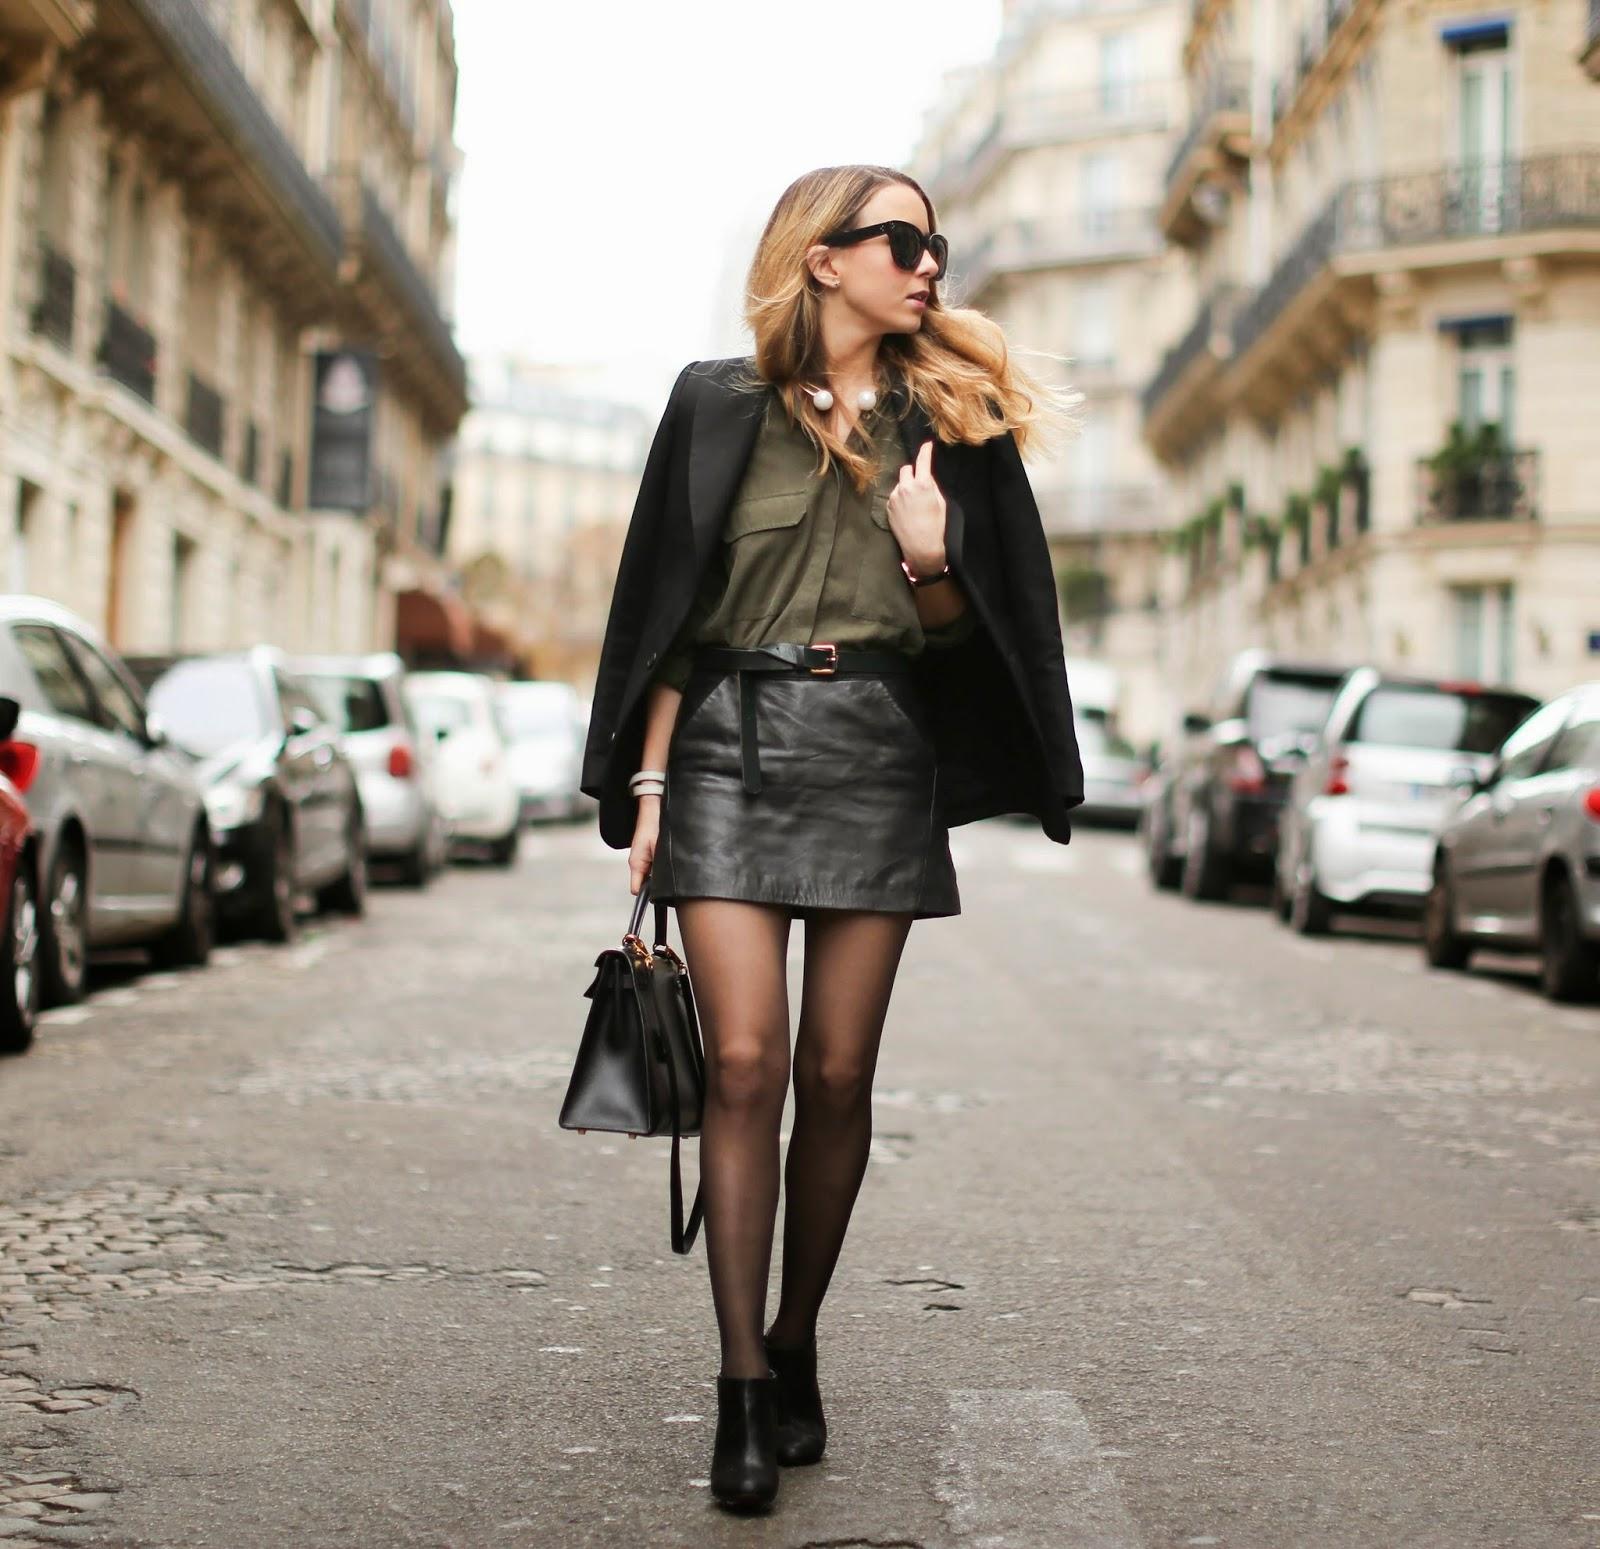 topshop, vanessa bruno, zara, louboutin hermès, hermès kelly, fashion blogger, streetstyle, leather,